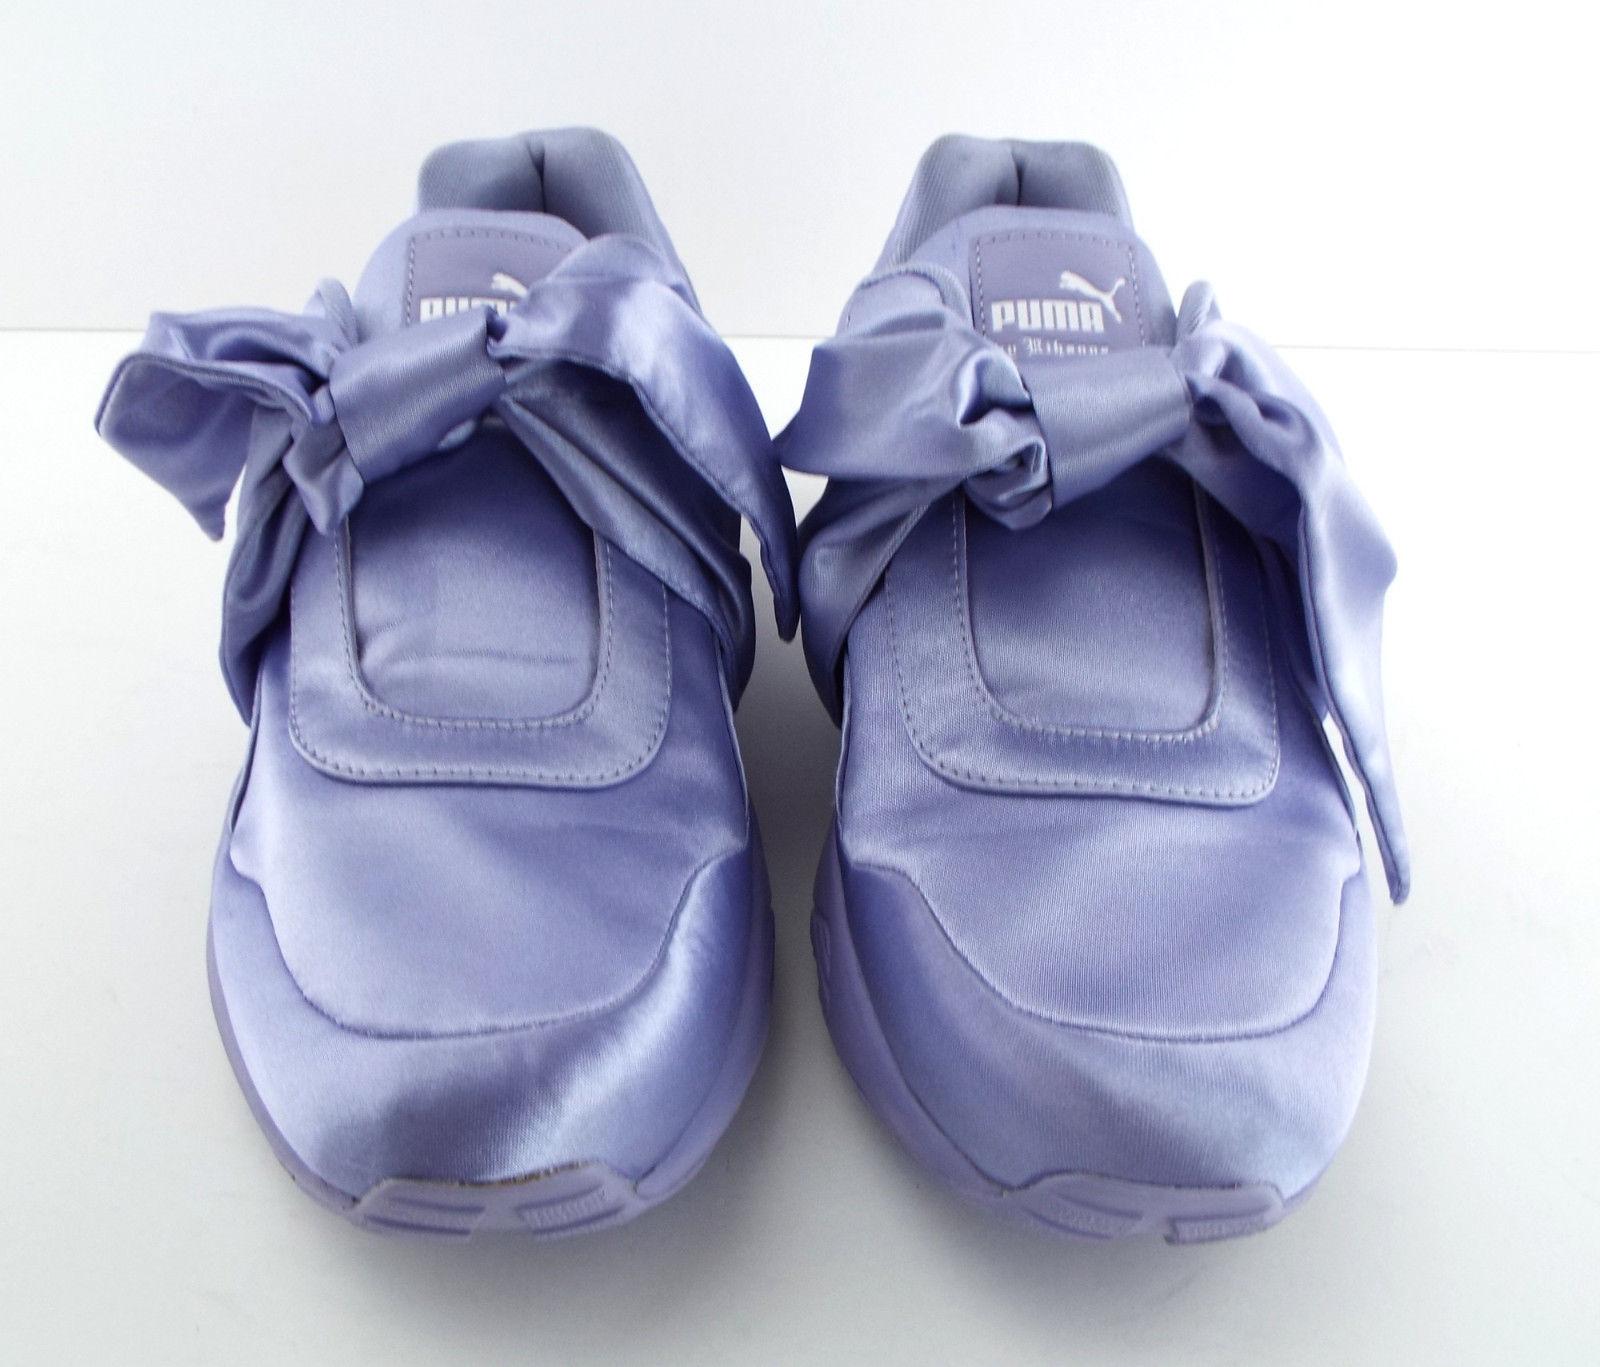 New PUMA RIHANNA Size 9 FENTY Purple Satin Bow Sneakers Shoes image 4